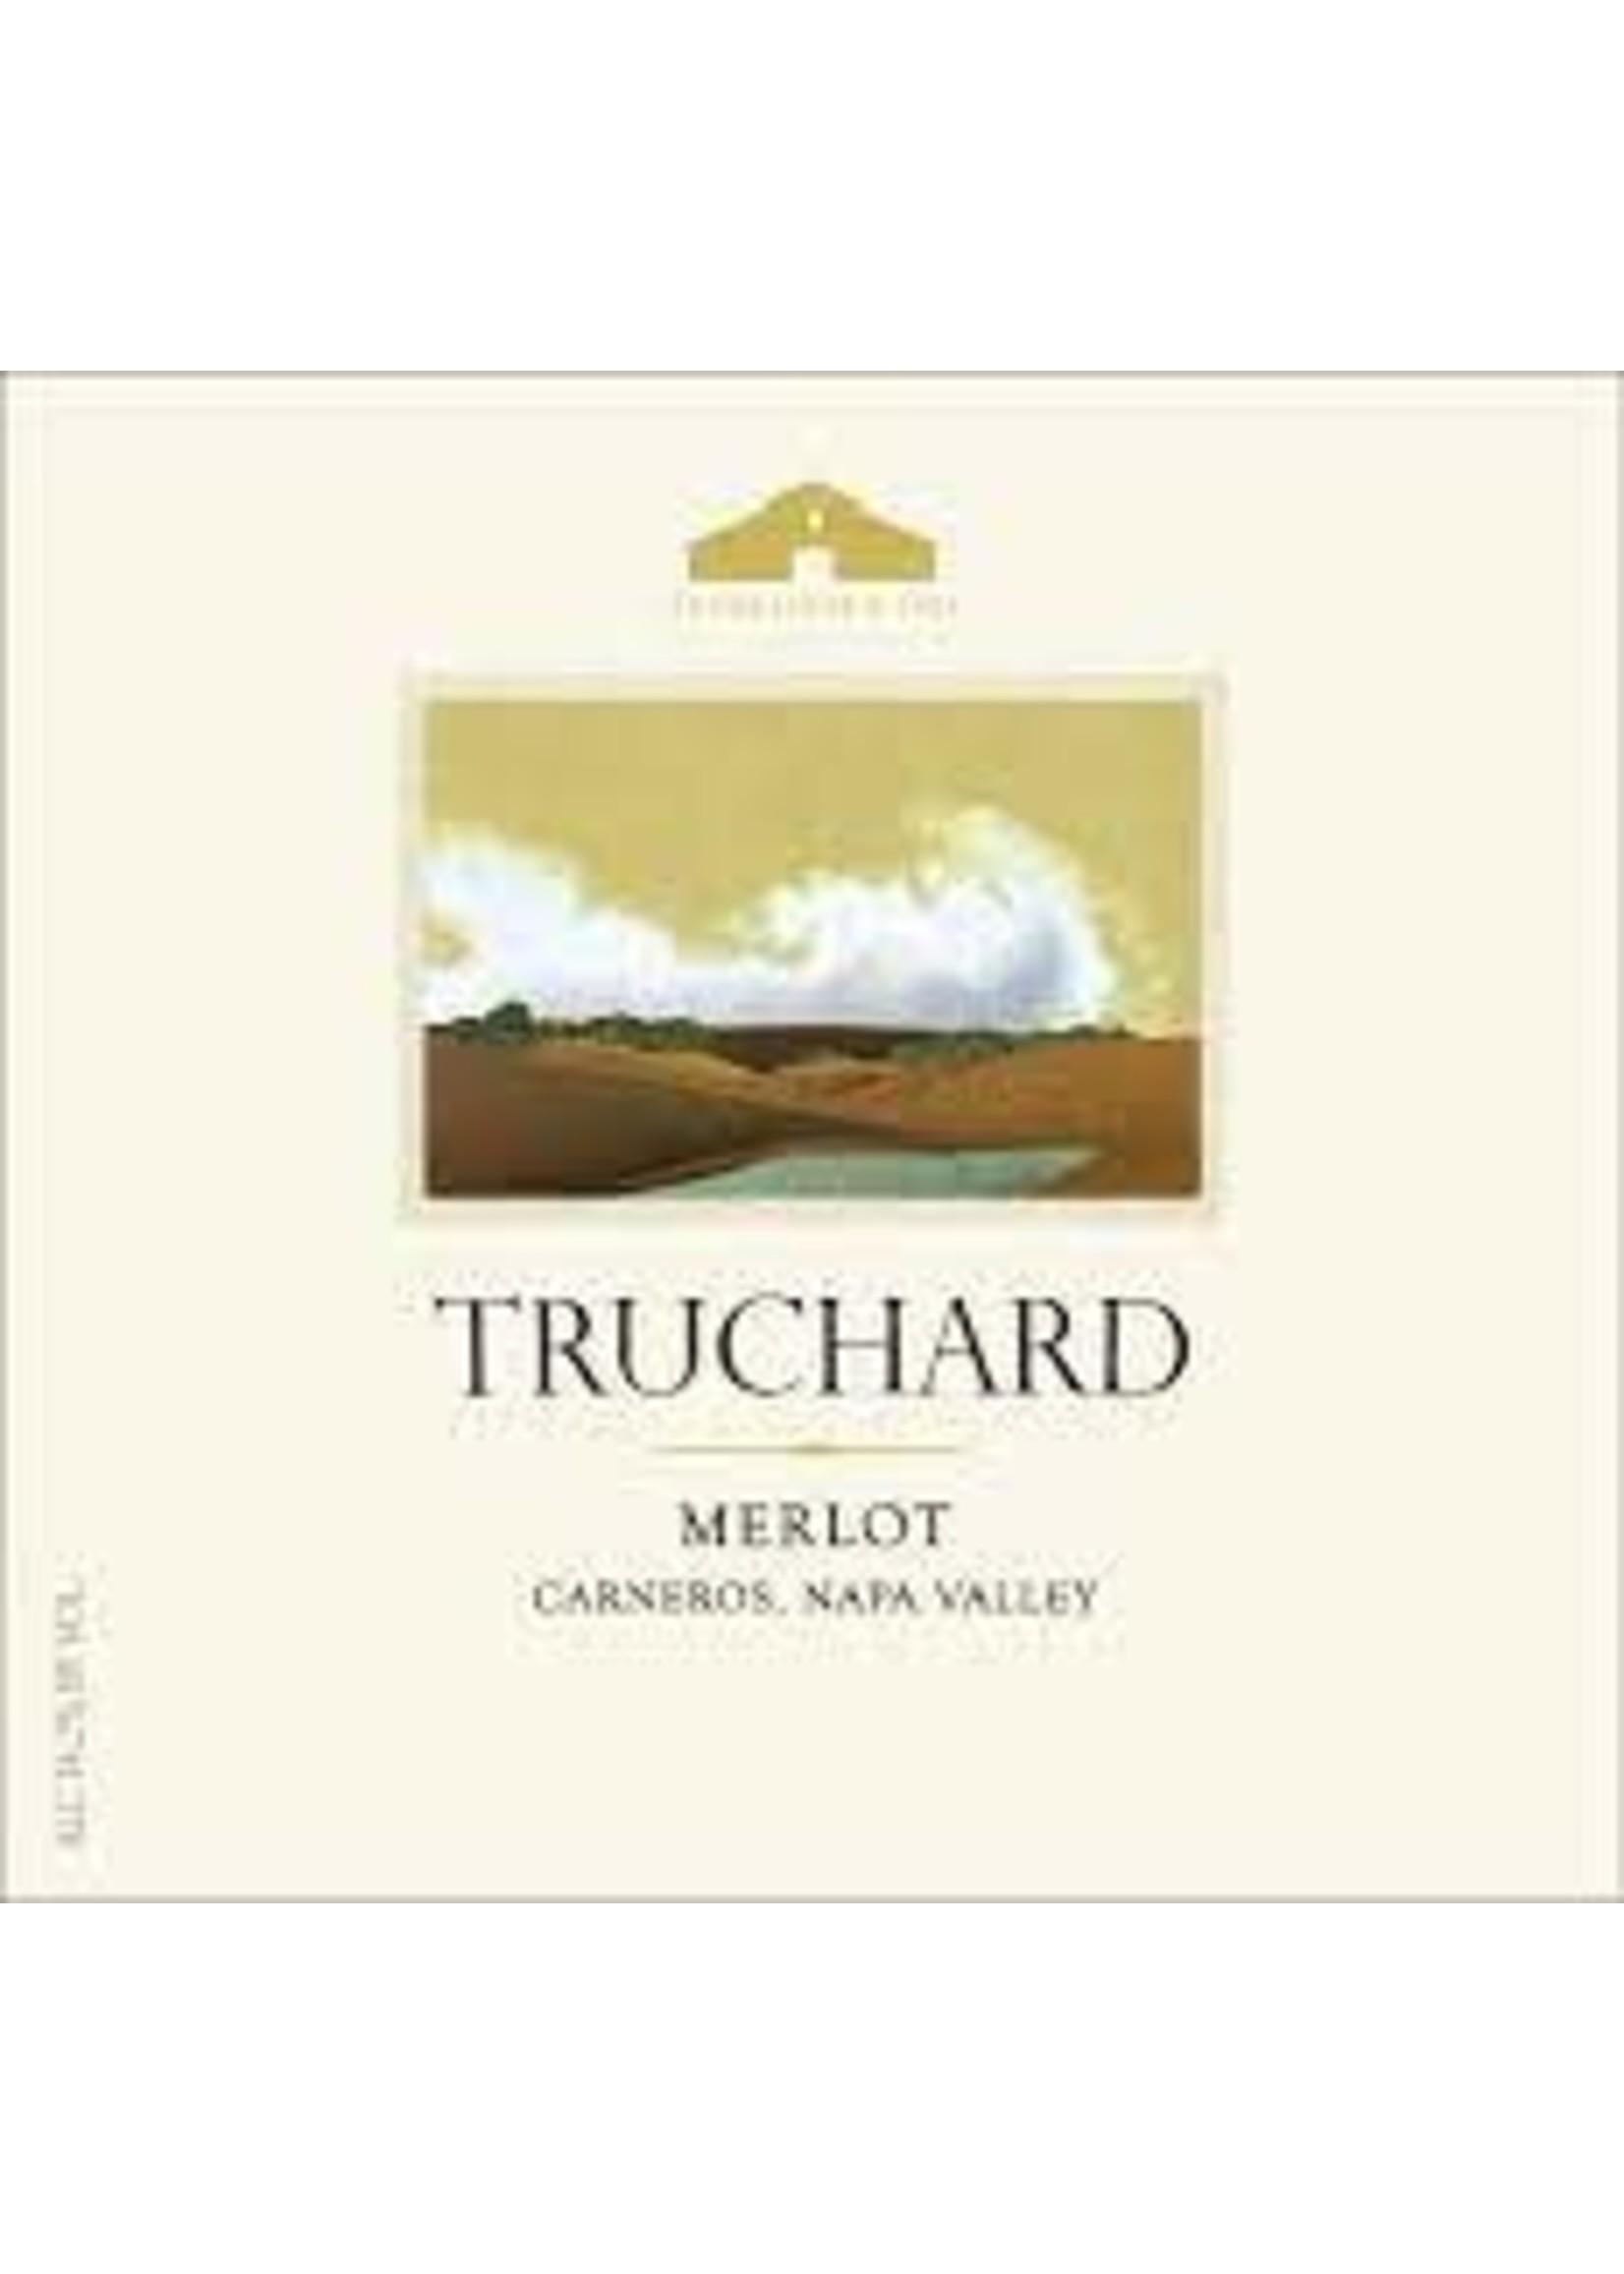 Truchard 2017 Merlot 750ml